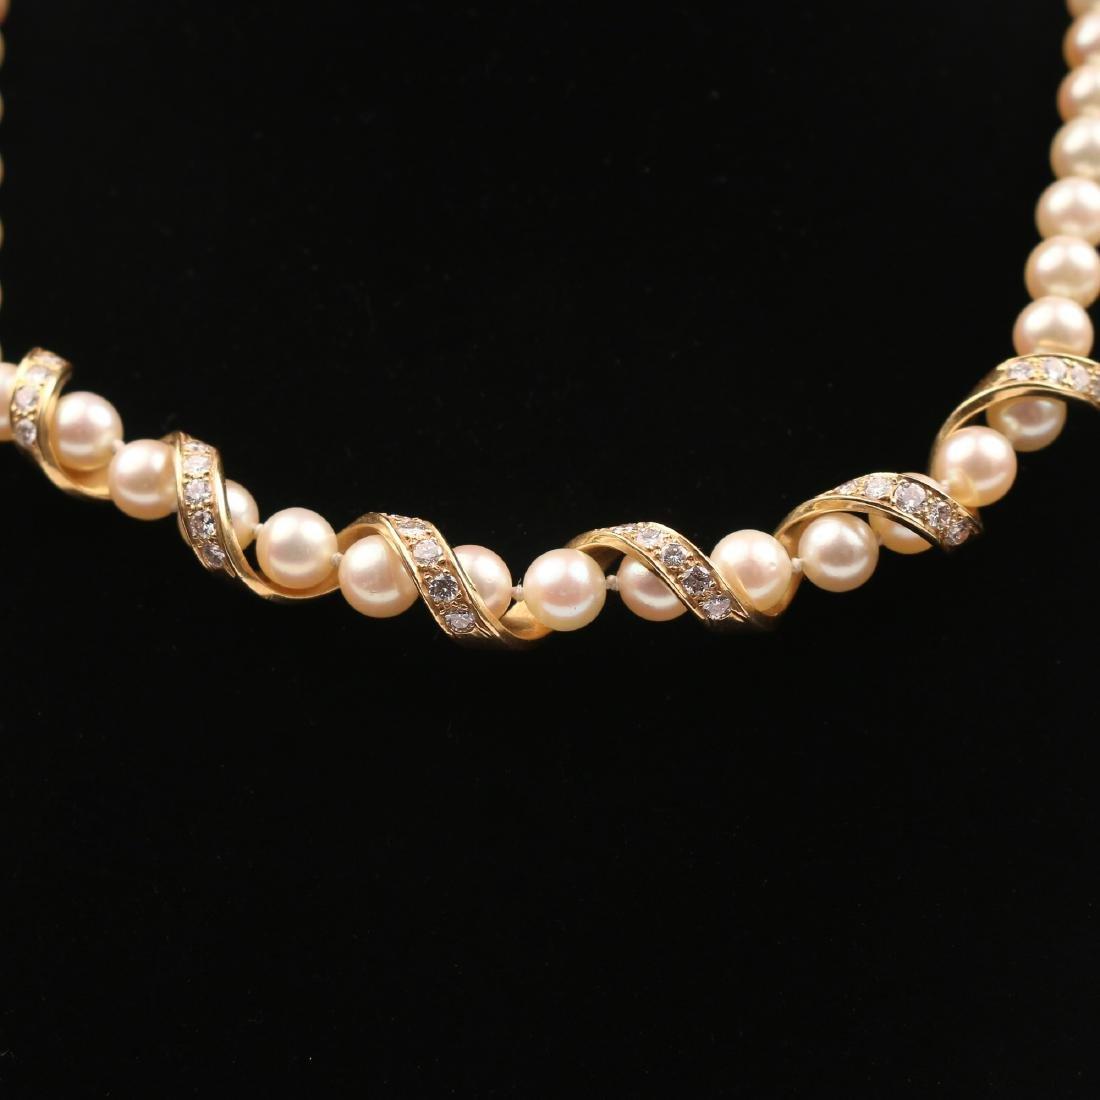 CARTIER TWIST DIAMOND, PEARL, & GOLD NECKLACE - 6